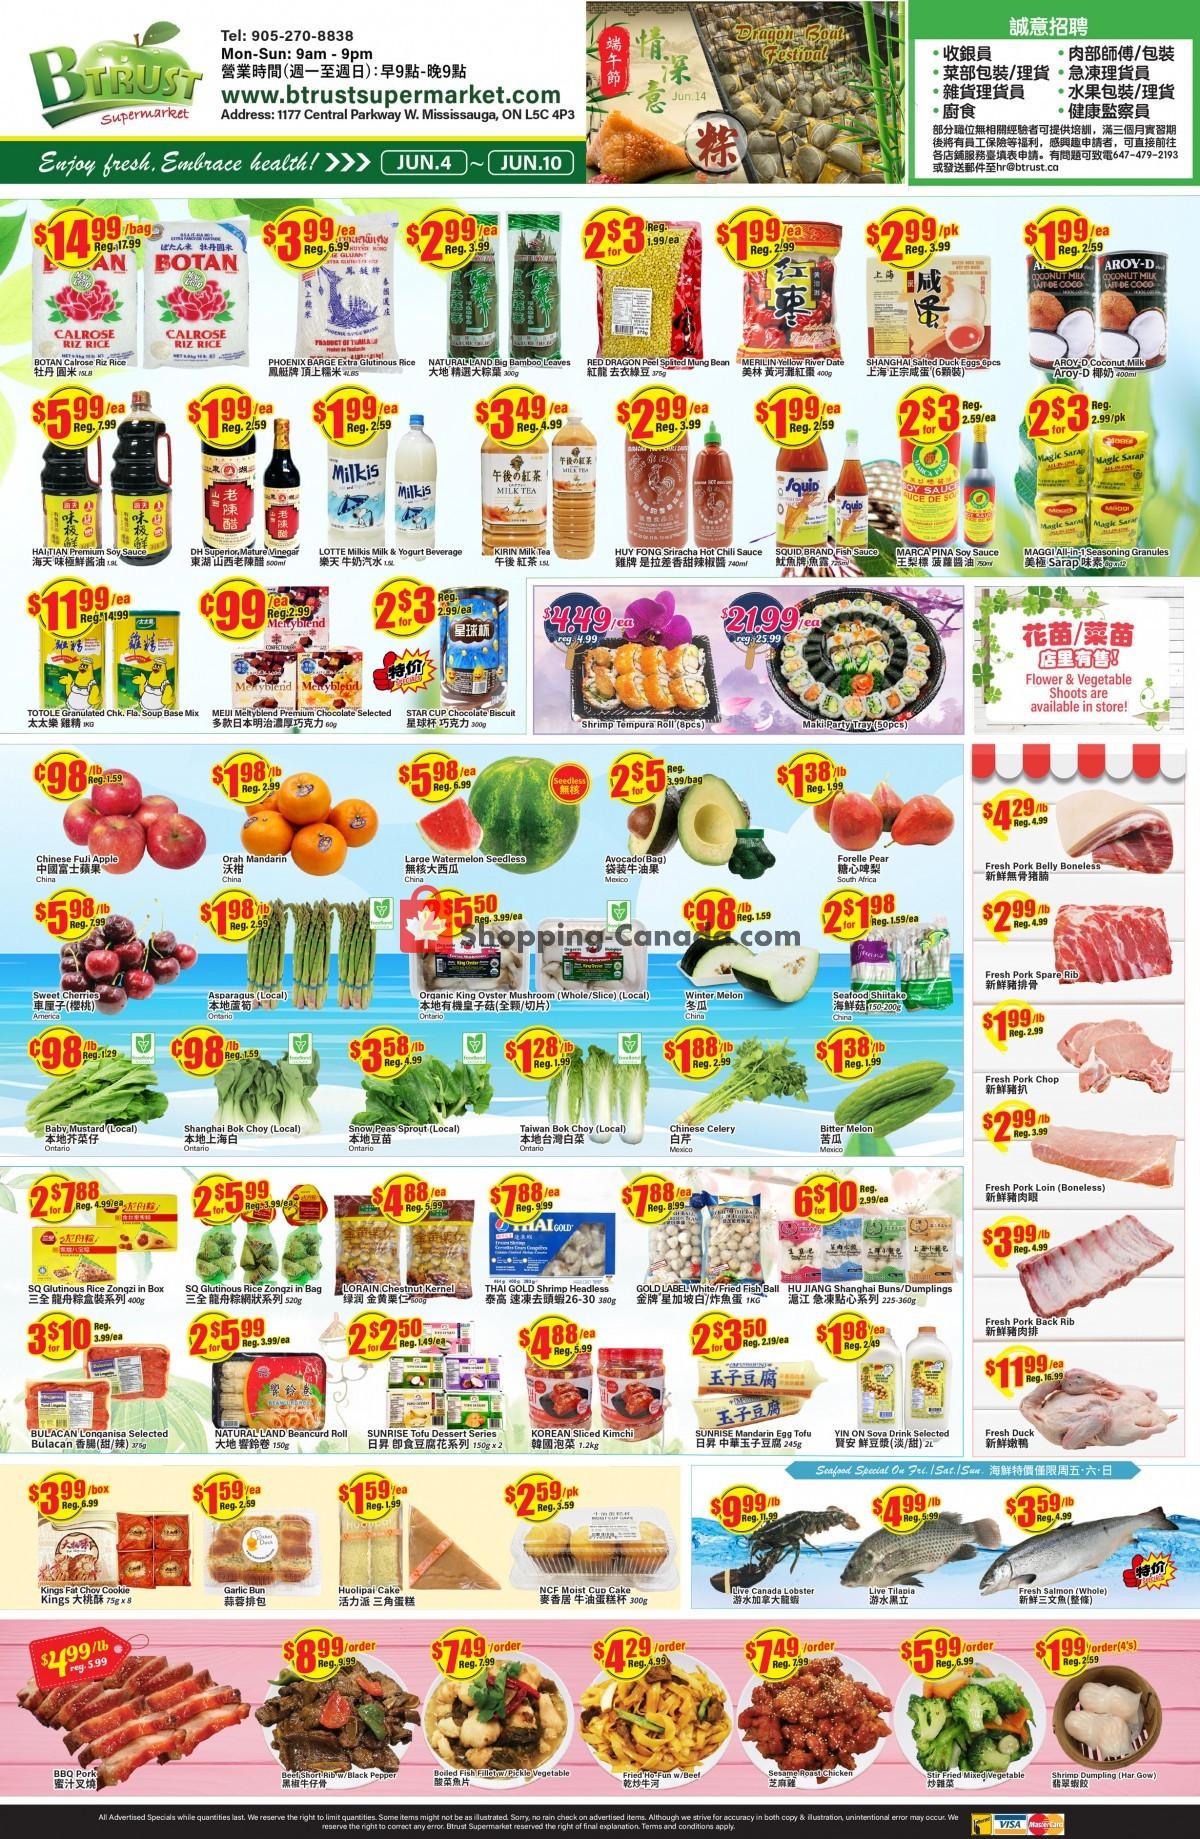 Flyer Btrust Supermarket Canada - from Friday June 4, 2021 to Thursday June 10, 2021